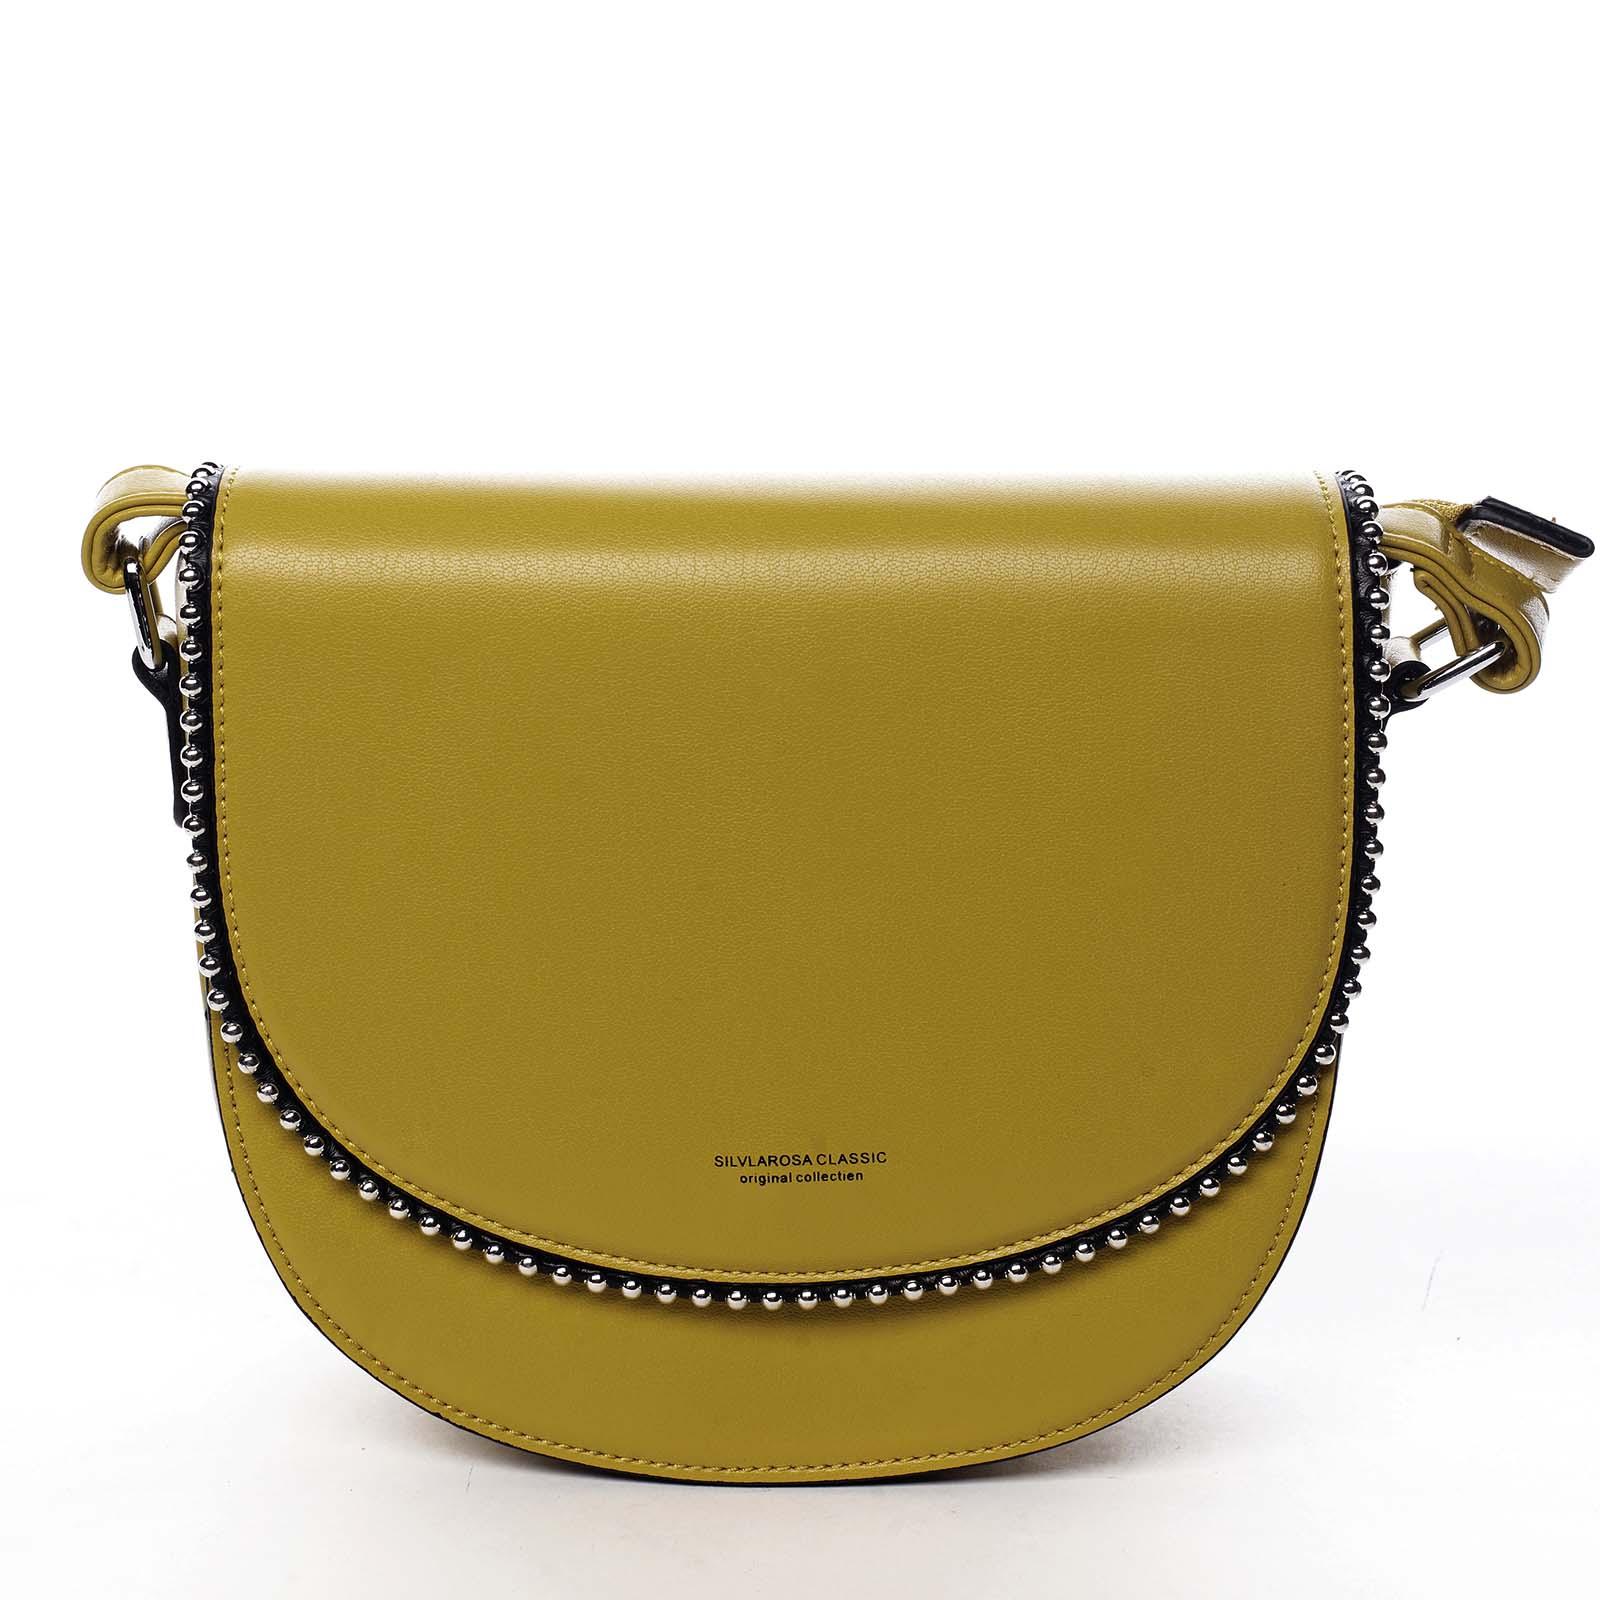 Dámská crossbody kabelka žlutá - Silvia Rosa Evolve